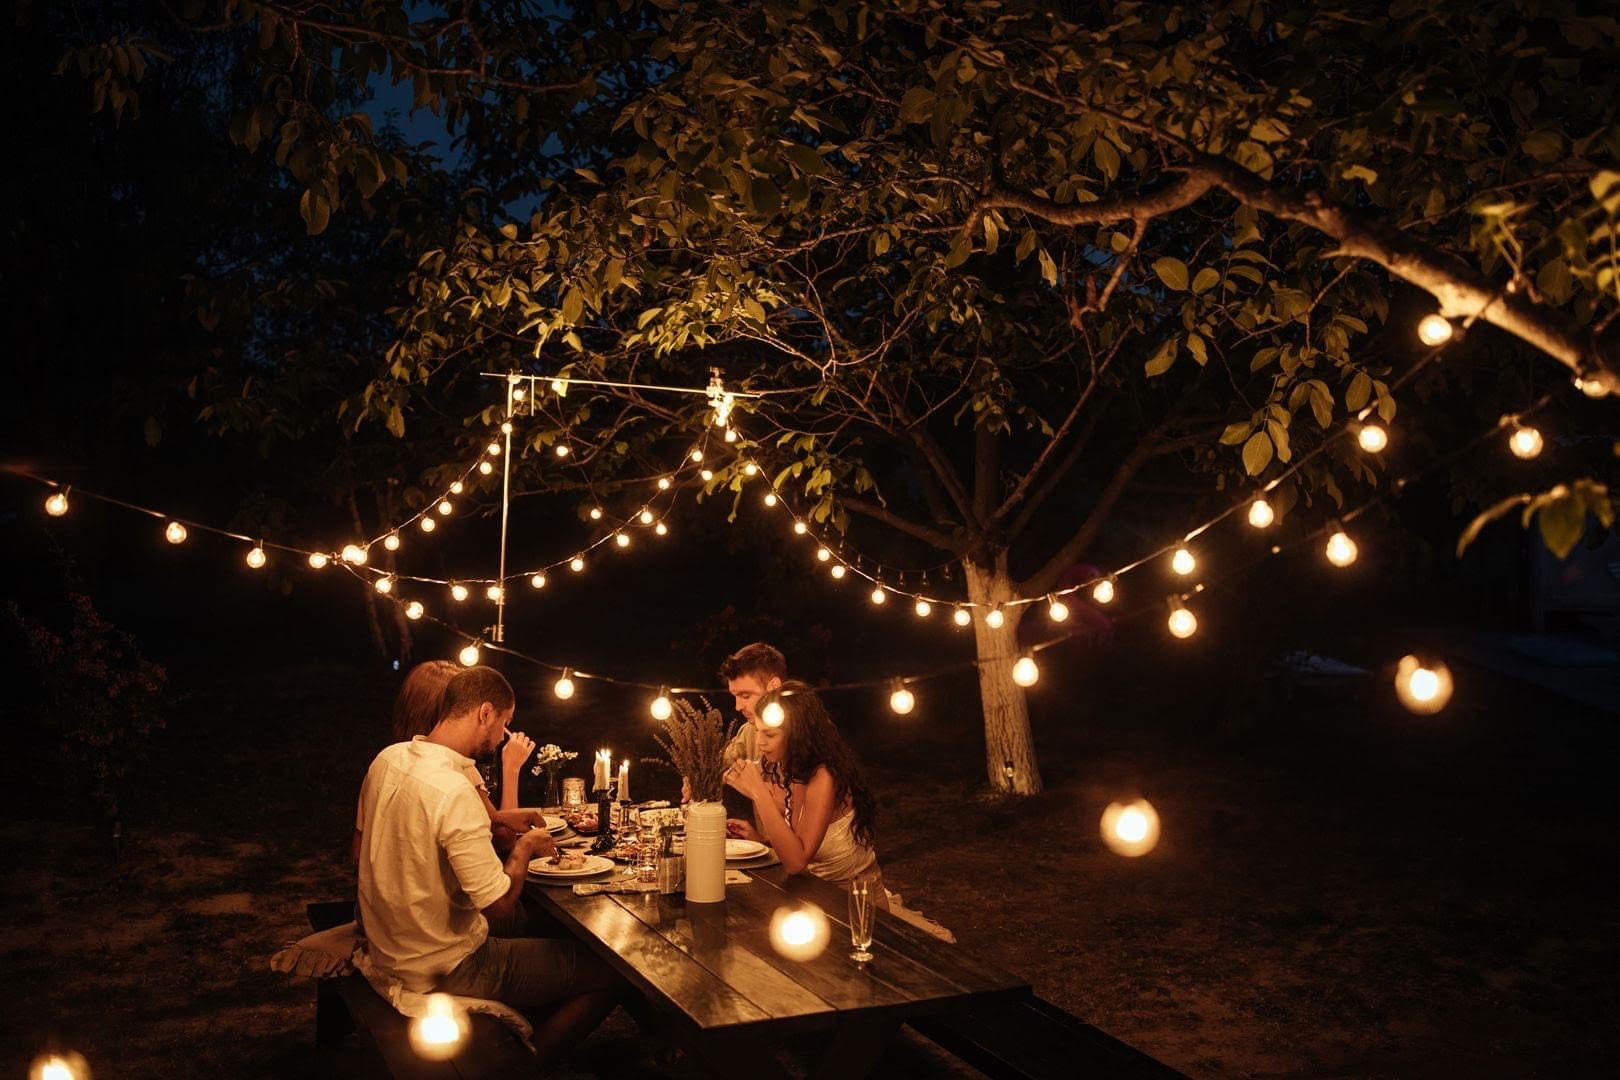 Backyard lighting installations